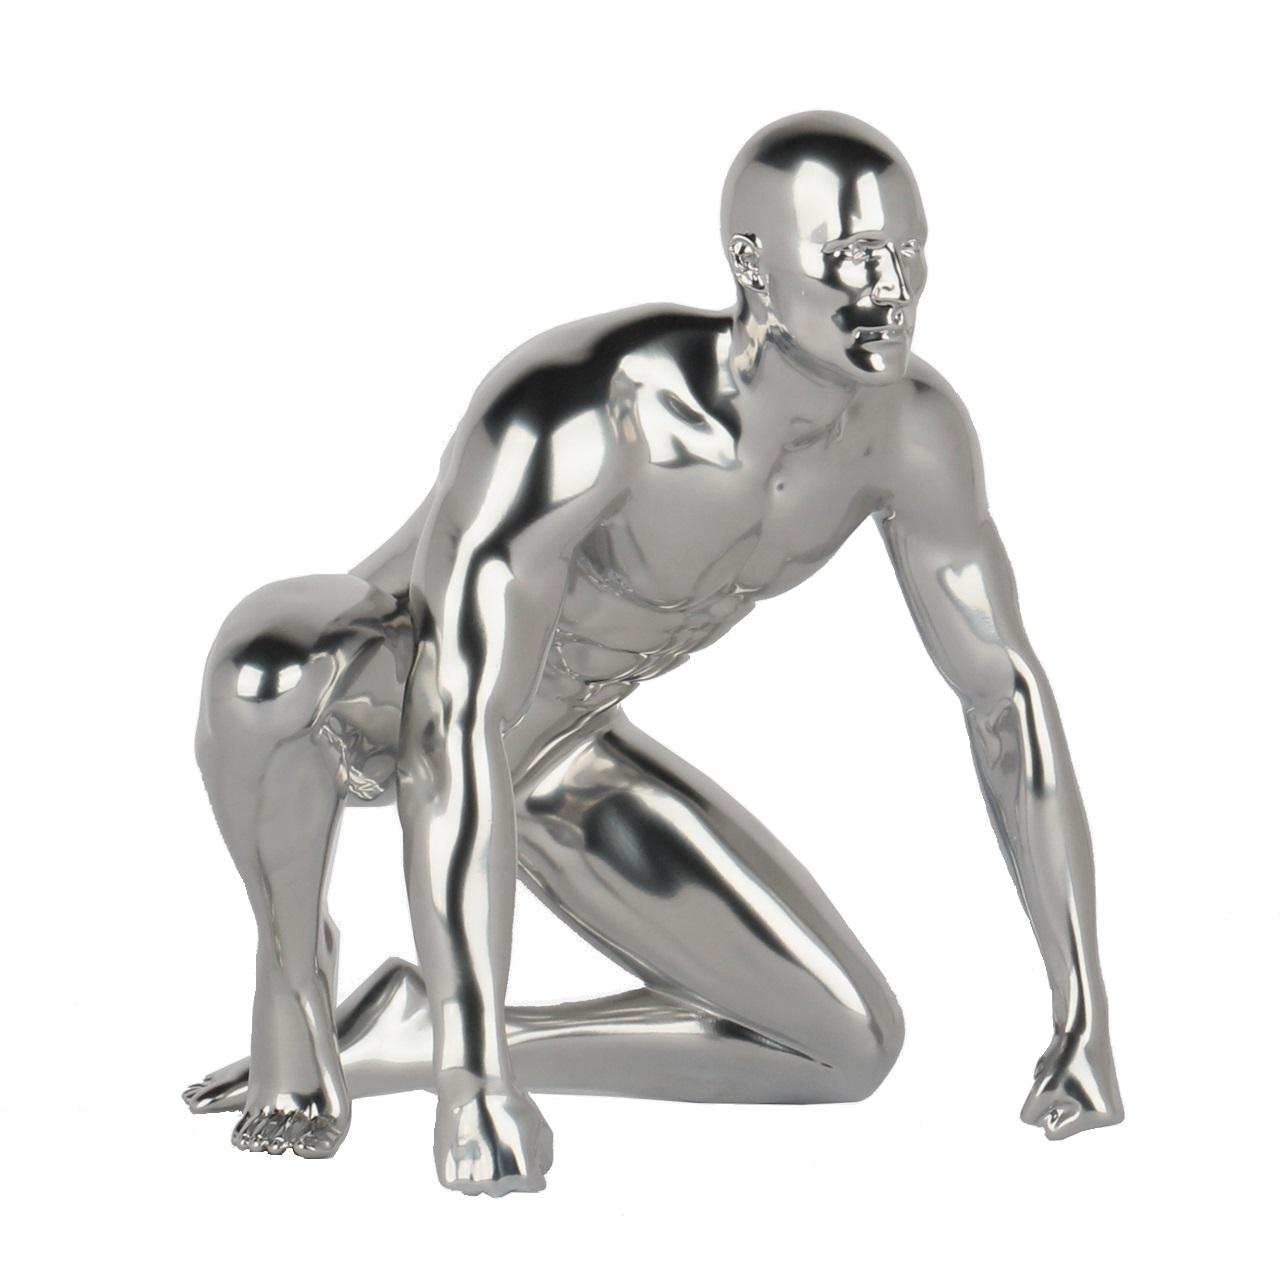 Poly Resin Redemption Sculpture Metallic Silver